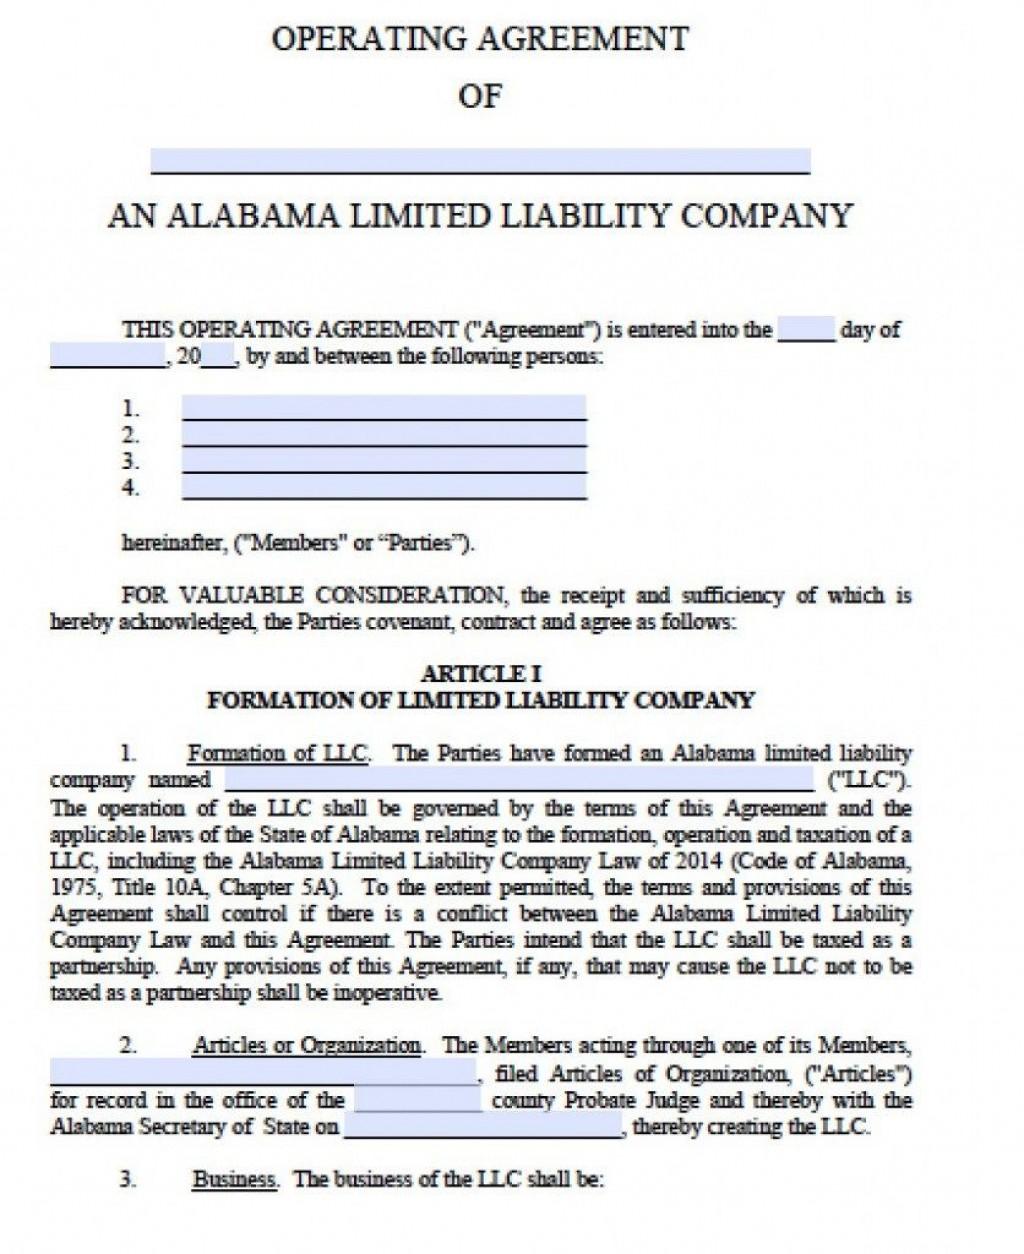 001 Unique Operation Agreement Llc Template Sample  Operating Florida Indiana Single Member CaliforniaLarge